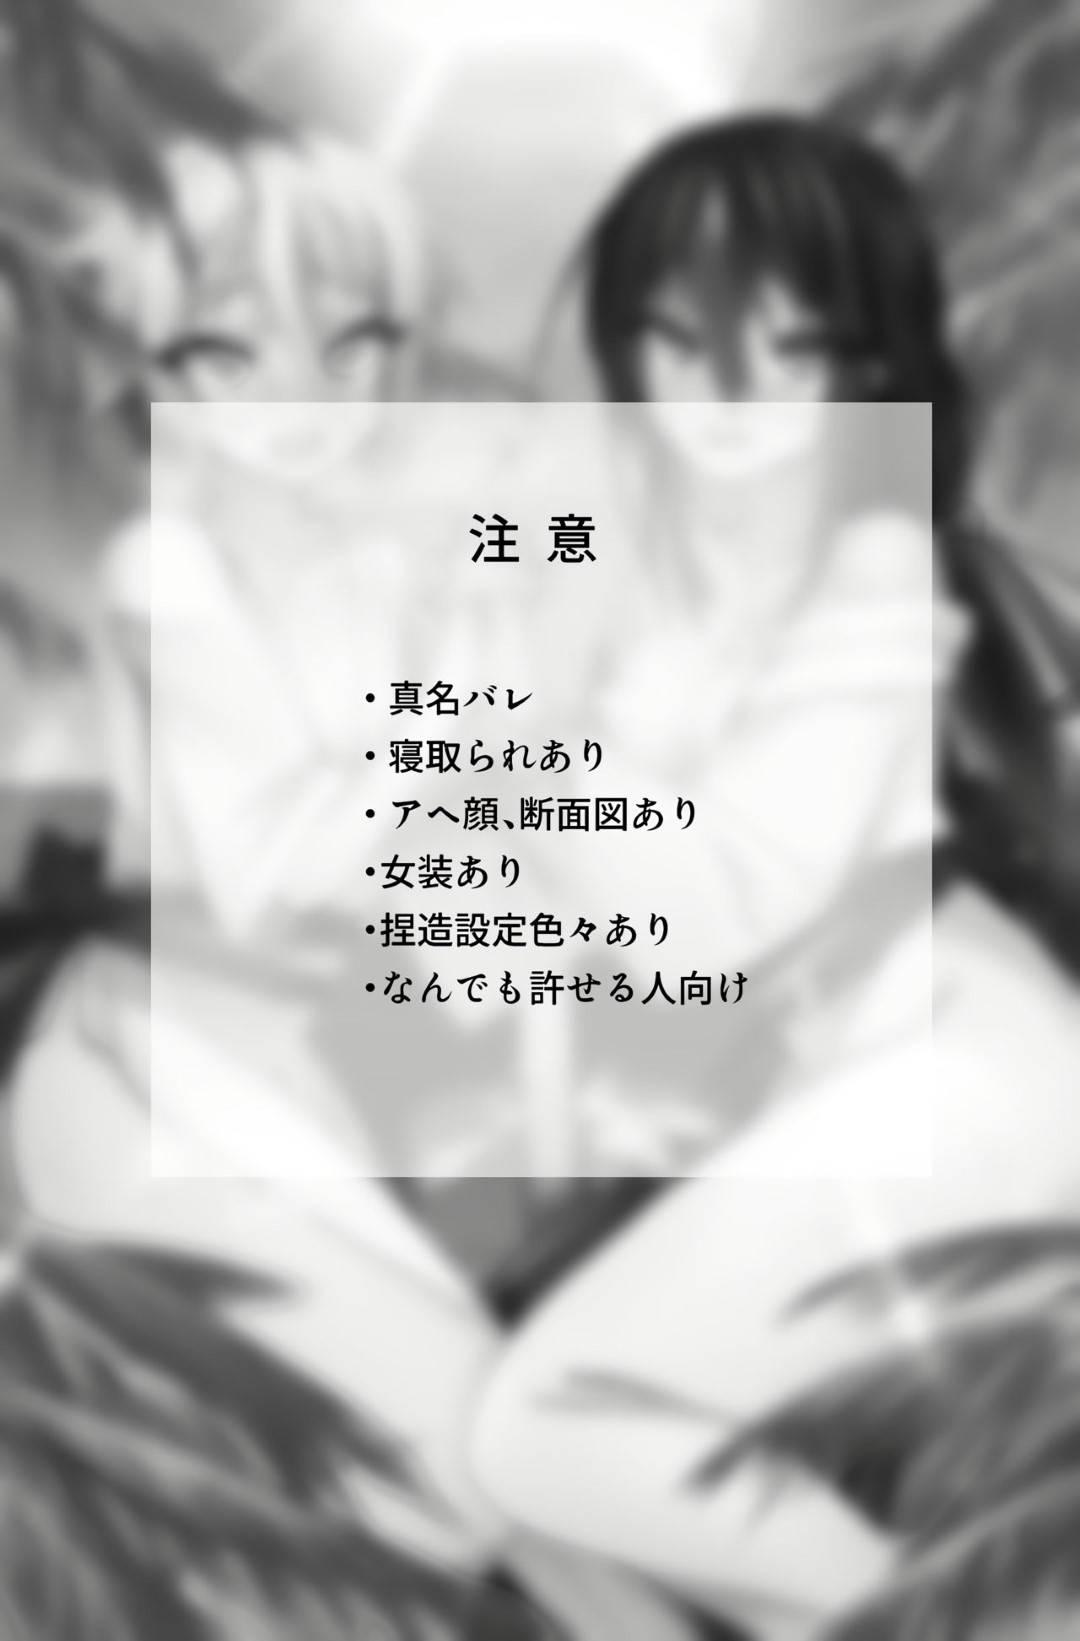 【Fate/Grand Orderエロ漫画】性感按摩師にマッサージされた蘭陵王と燕青はアナルを犯され雌堕ちさせられる【なめ】